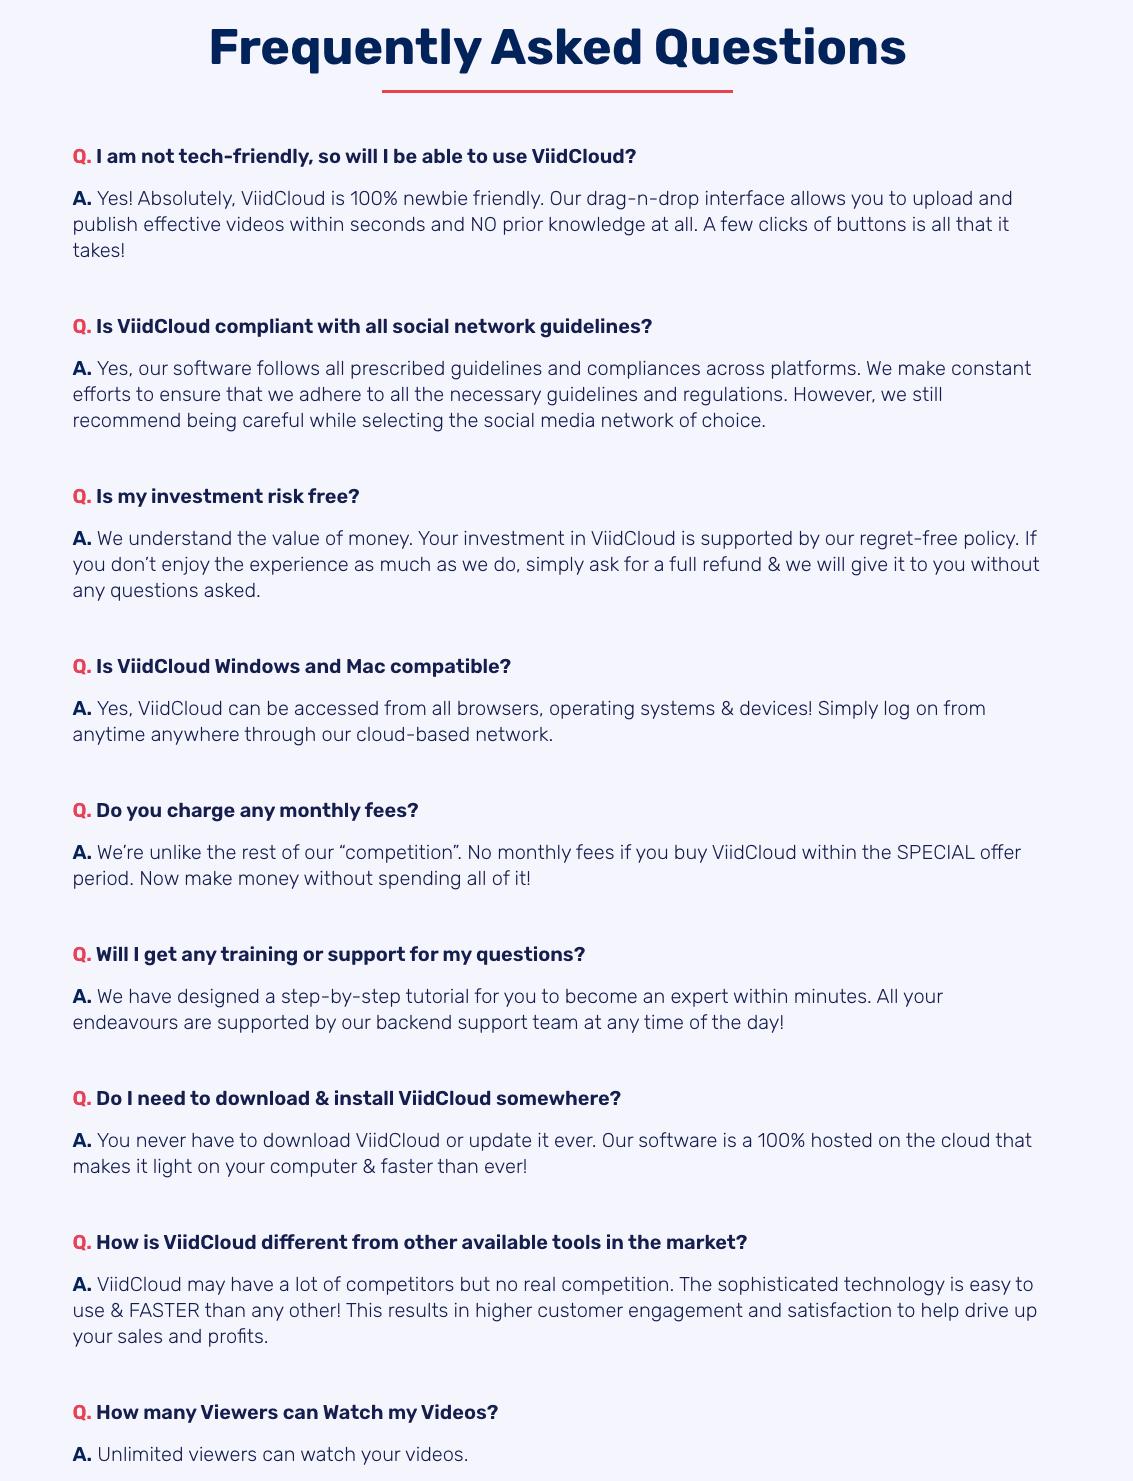 ViidCloud-Review-QA